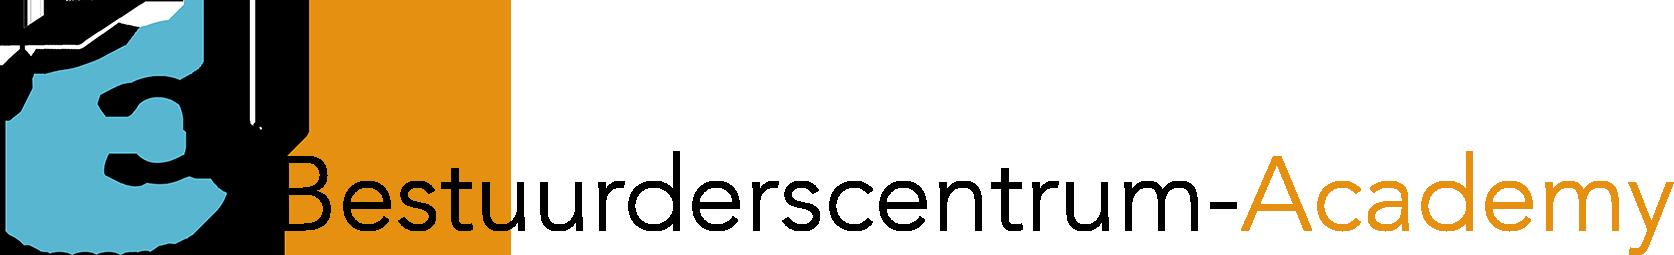 bestuurderscentrum-academy Logo